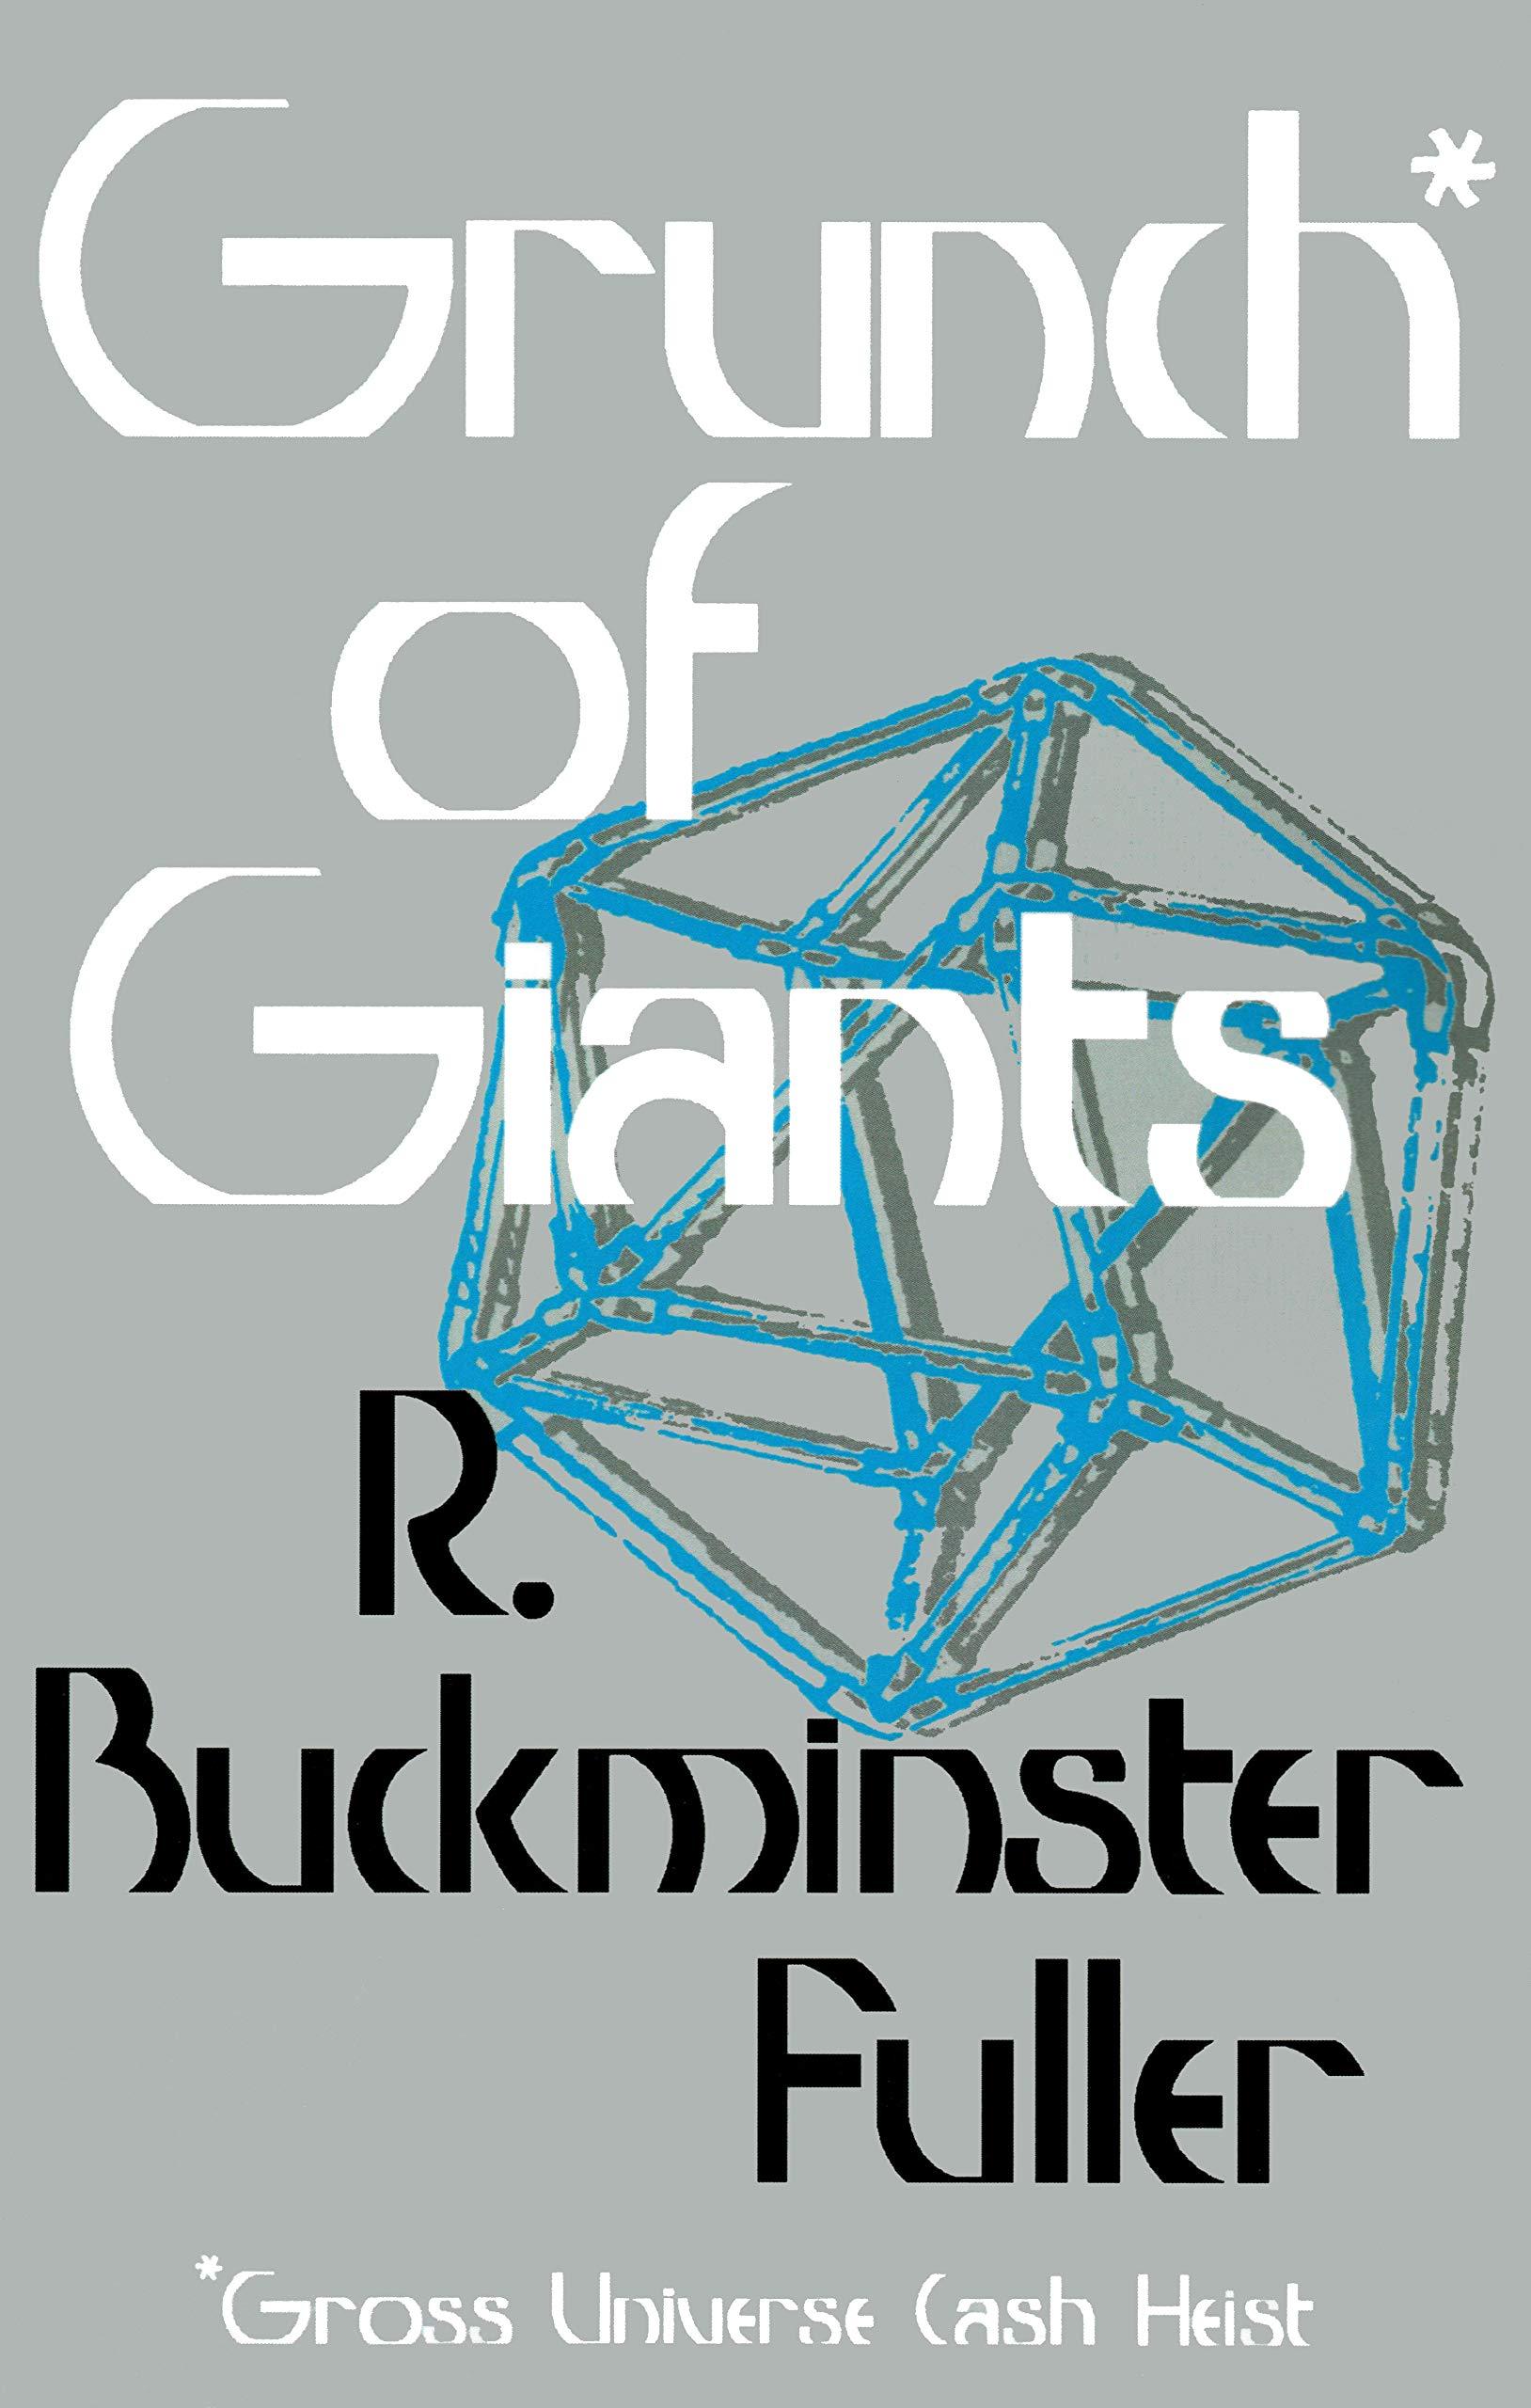 Grunch of Giants (Gross Universe Cash Heist)